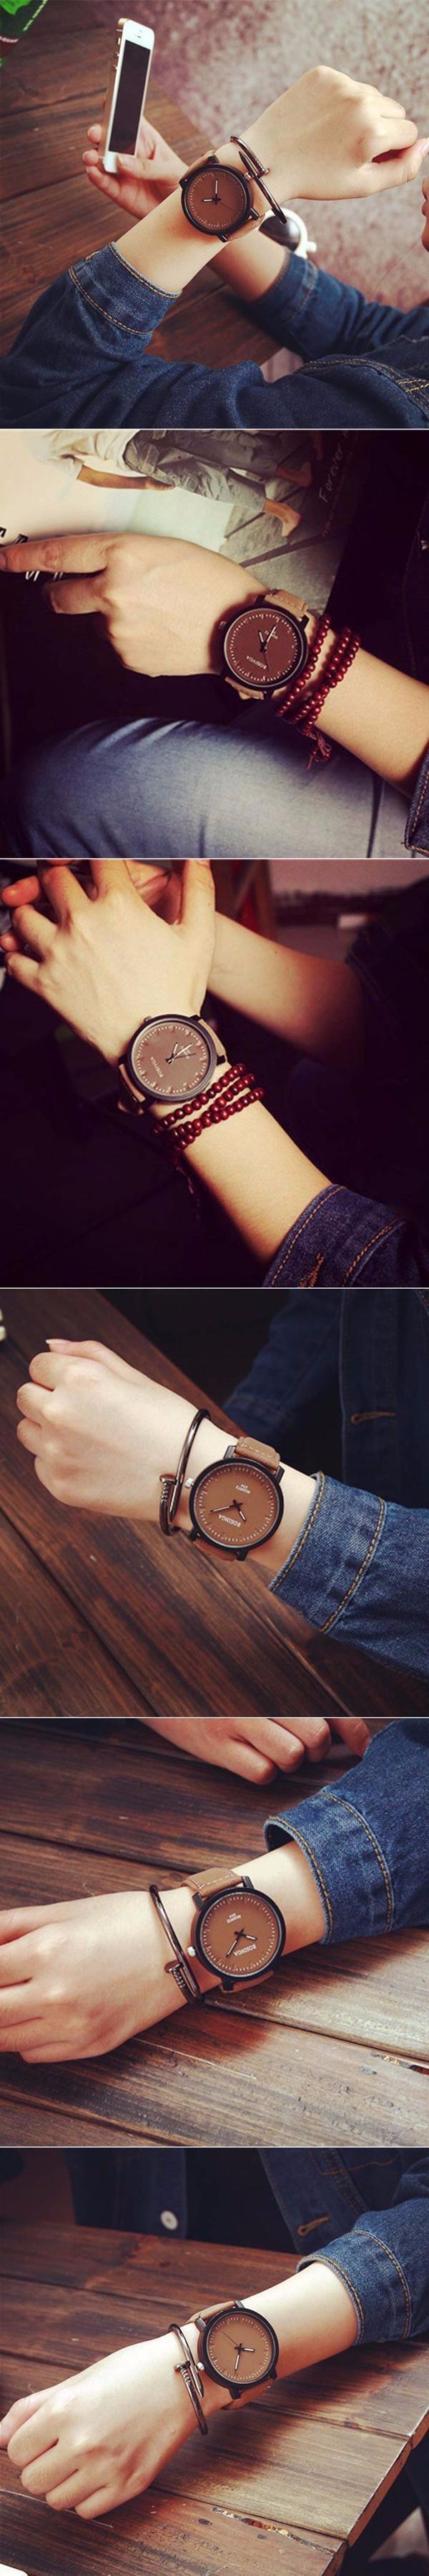 - HTB1h8TDMVXXXXXGXVXXq6xXFXXXj - UNISEX leather belt watches